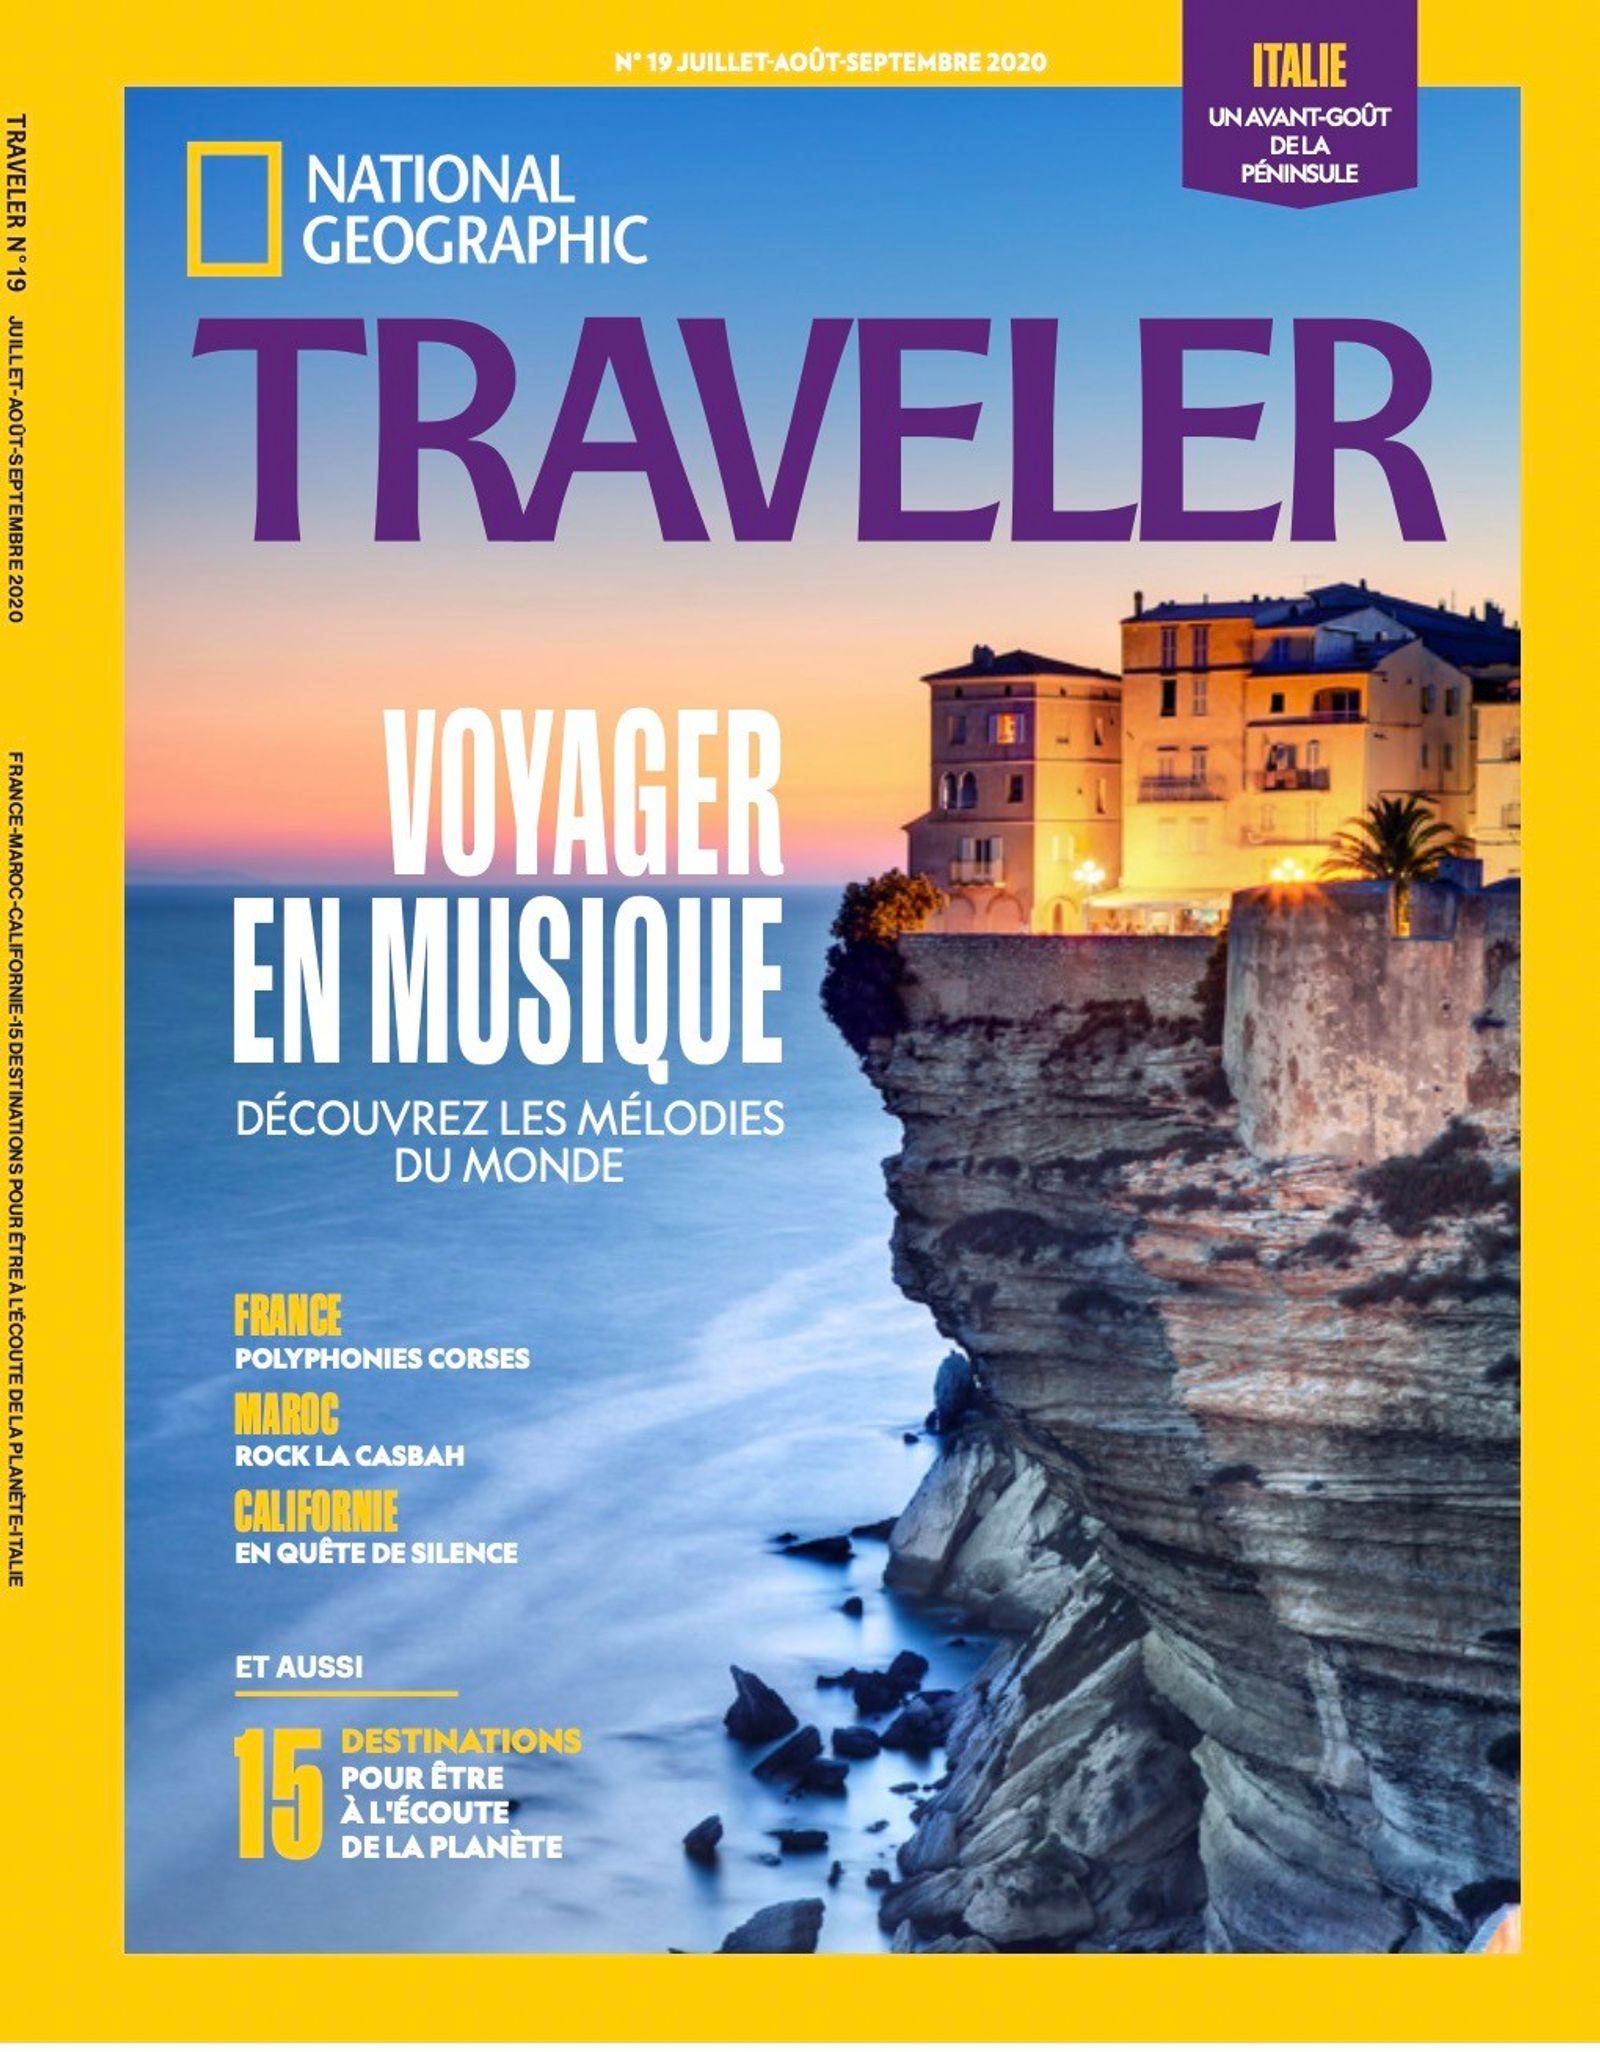 Sommaire du magazine Traveler n° 19 : Voyager en musique